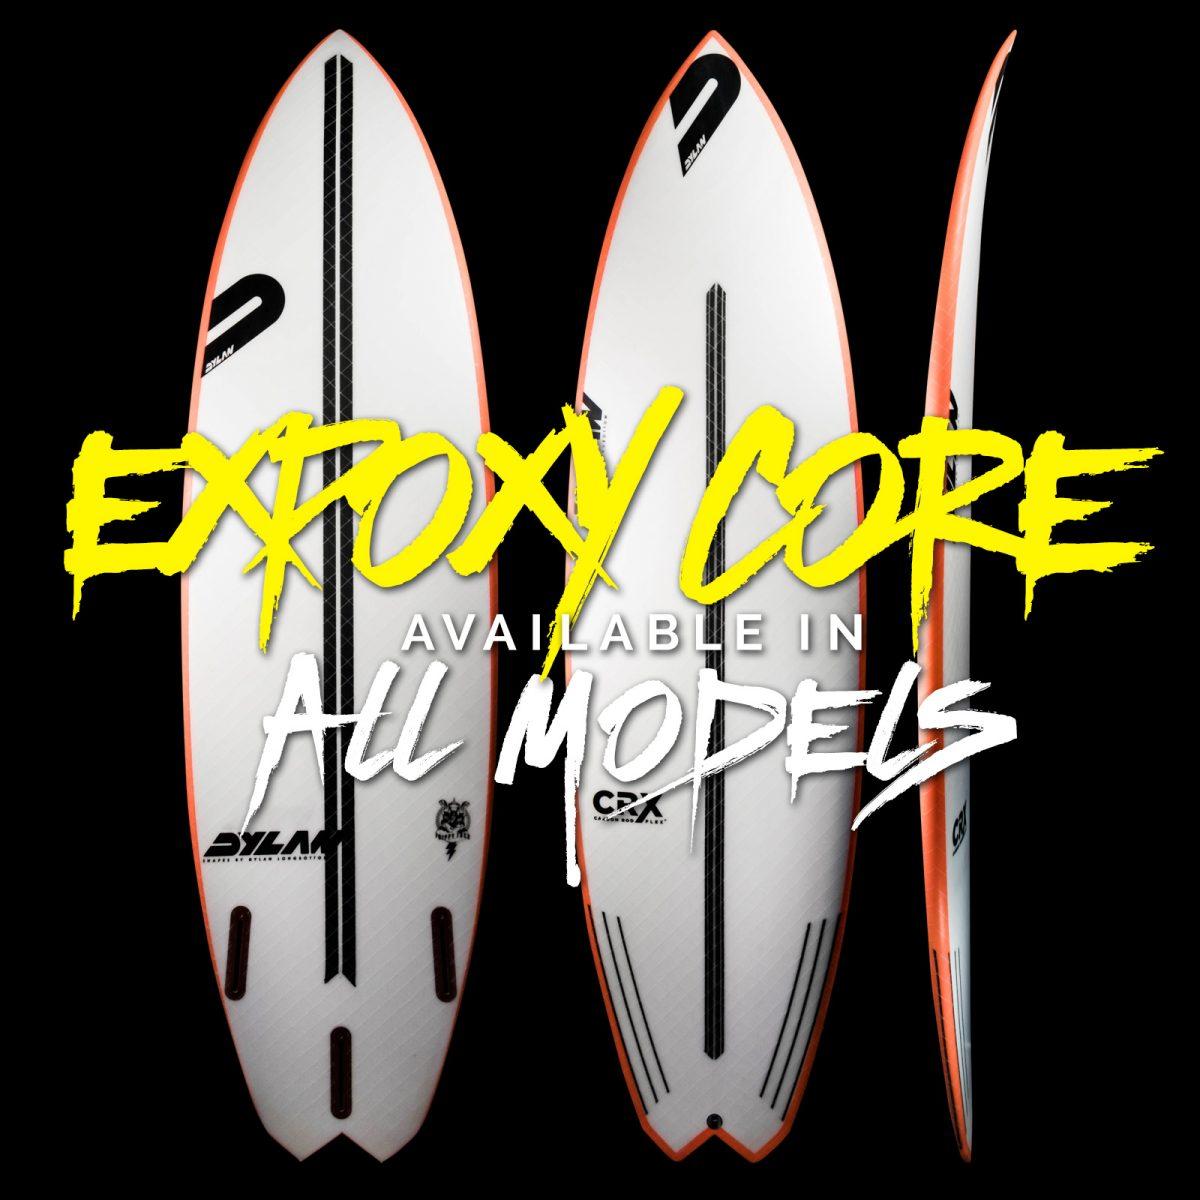 epoxy_core